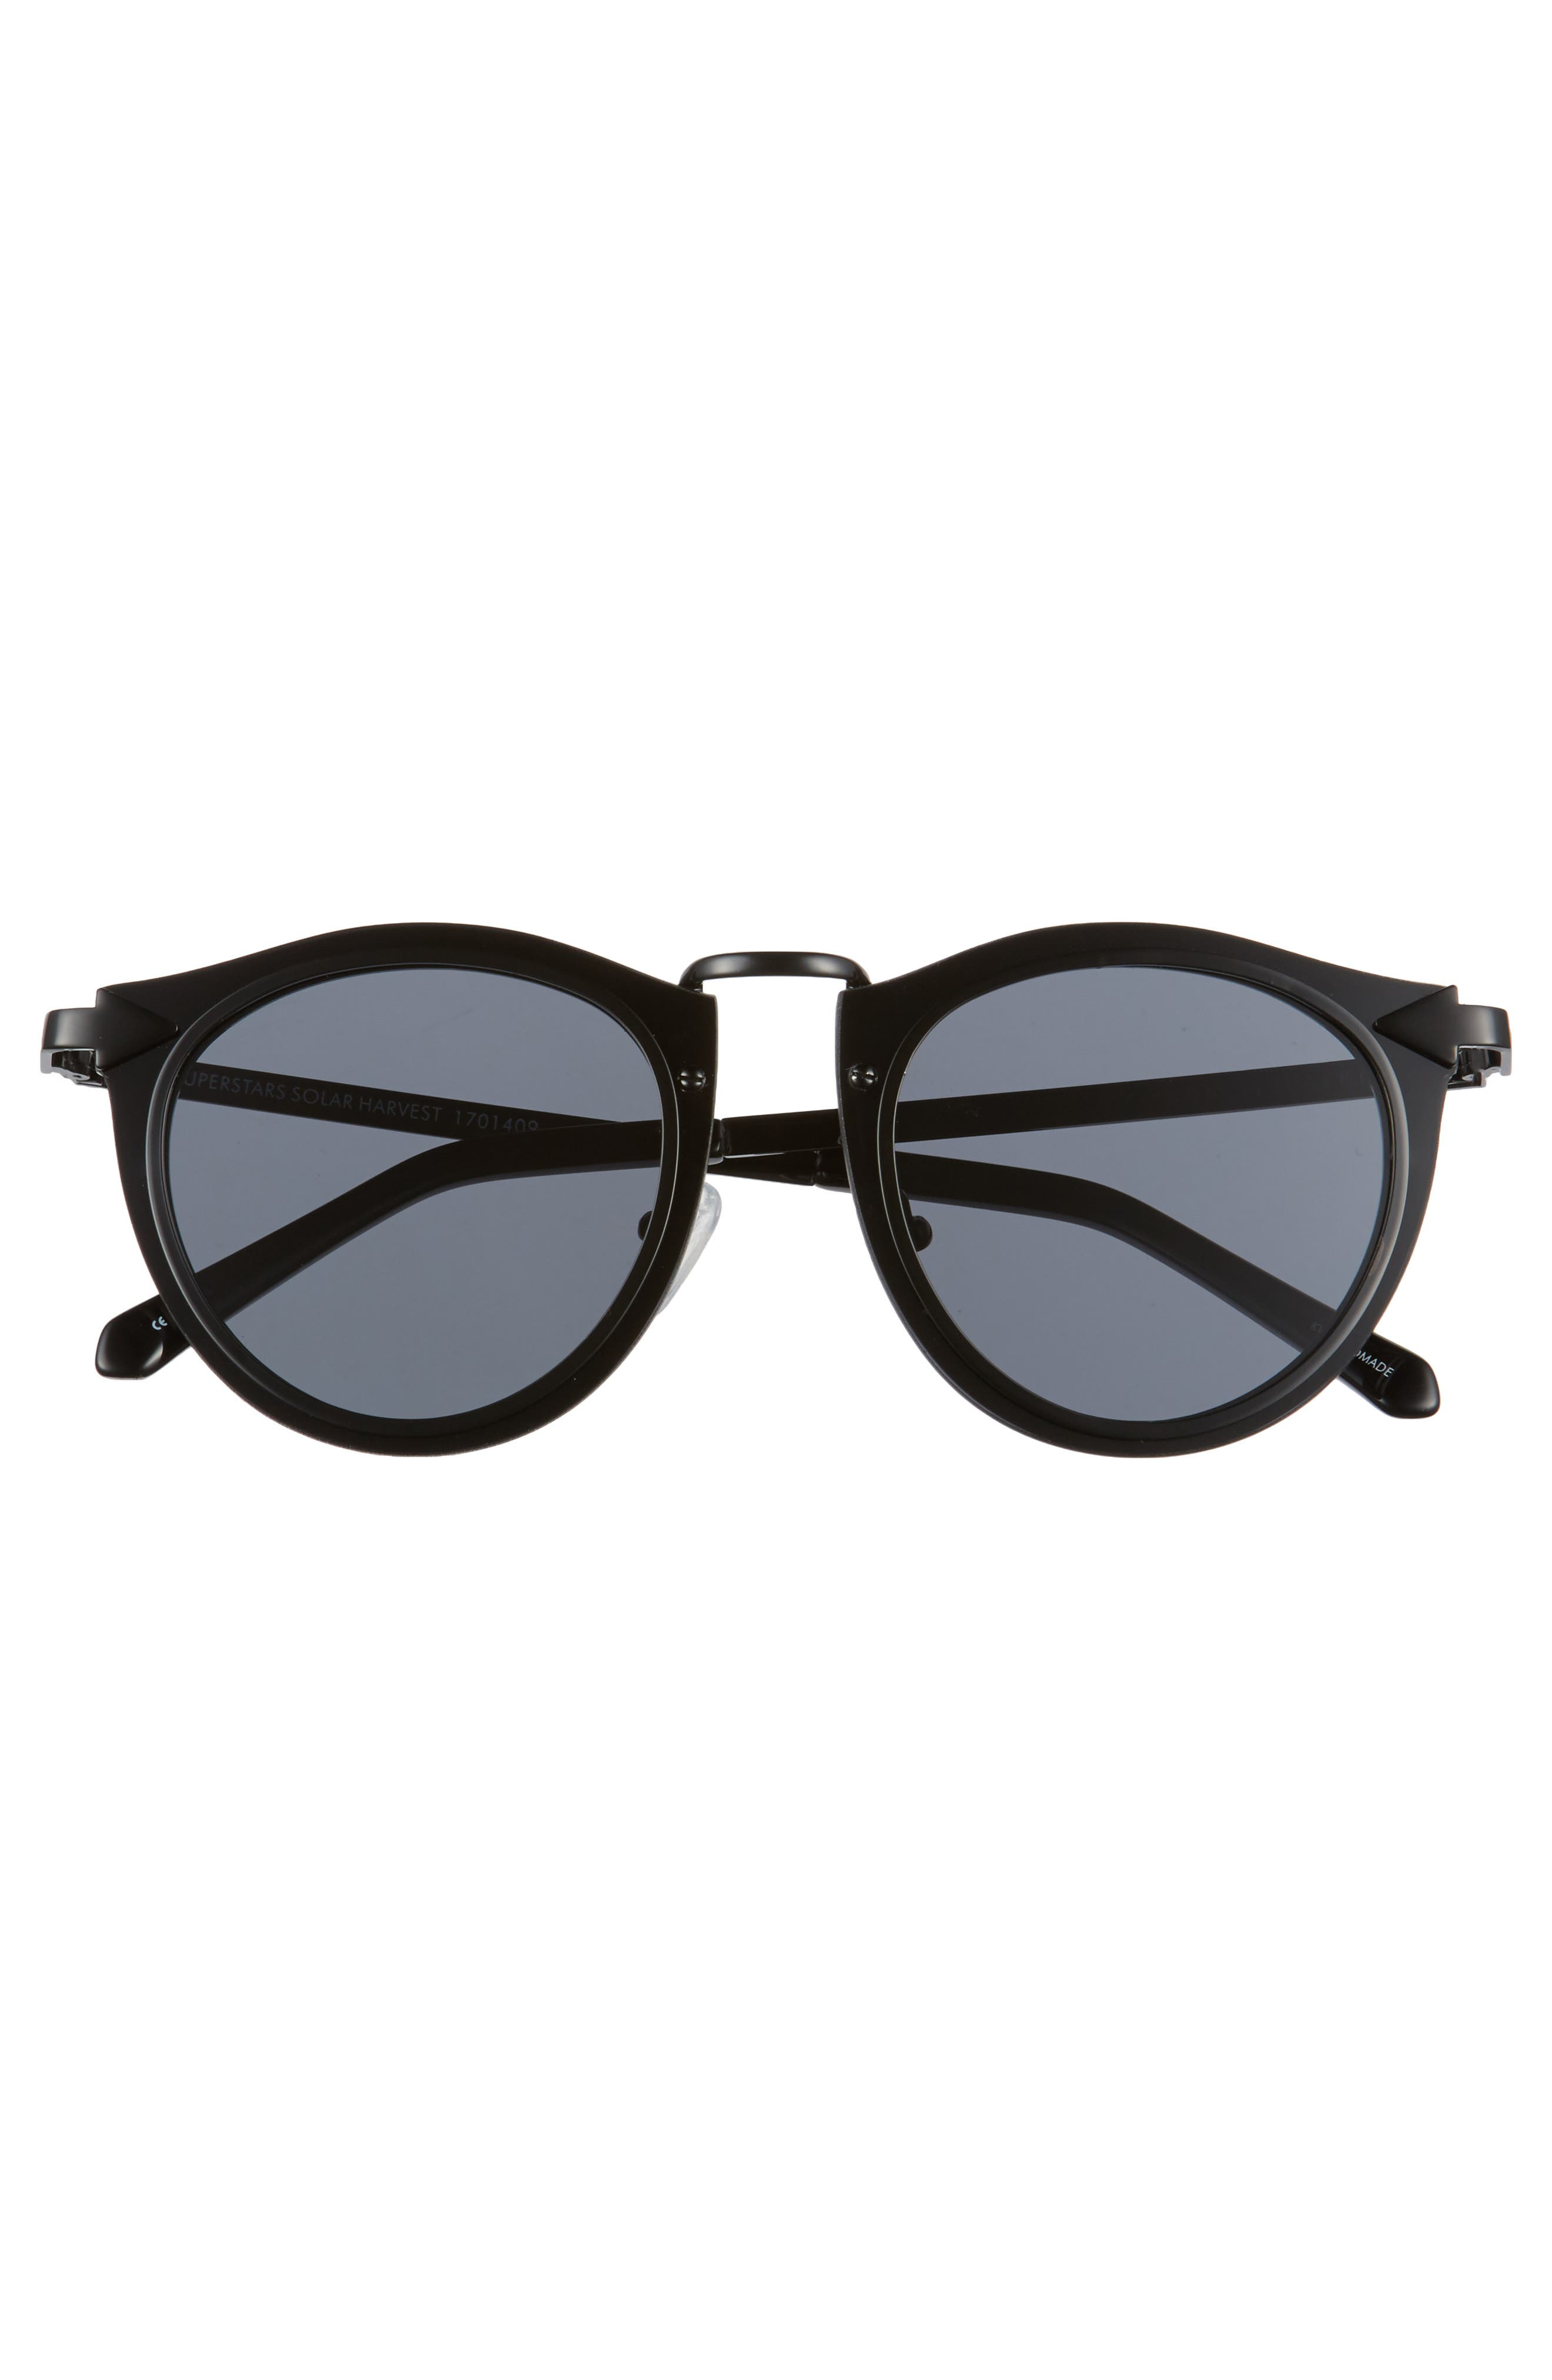 Superstars - Solar 50mm Retro Sunglasses,                             Alternate thumbnail 3, color,                             001